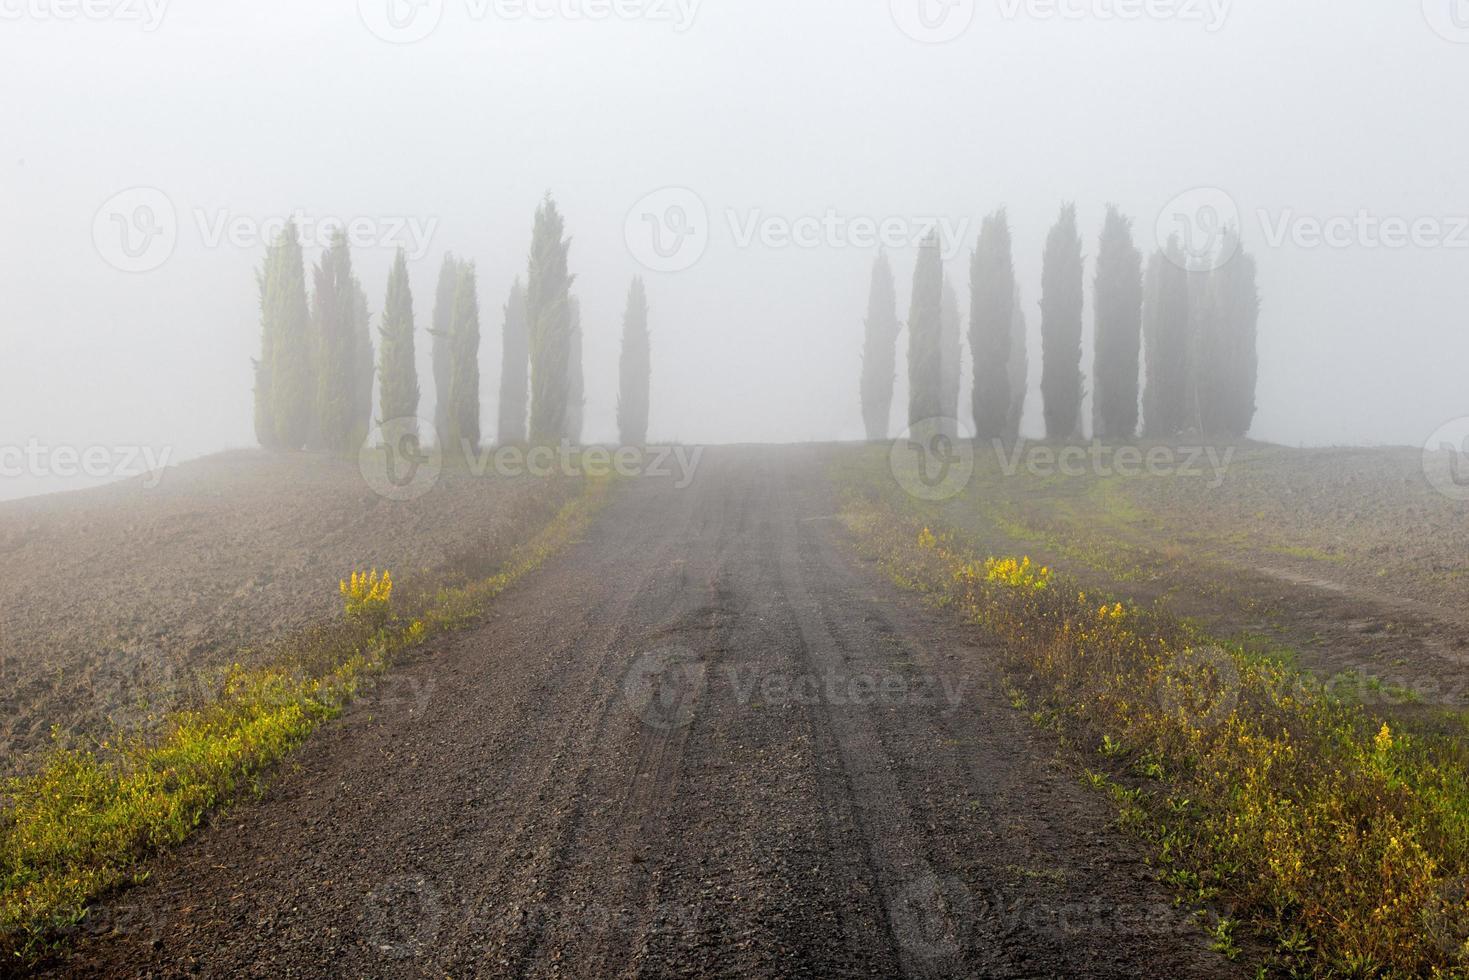 Toskana - Landschaftspanorama Hügel und Wiese Toscanana Italien foto